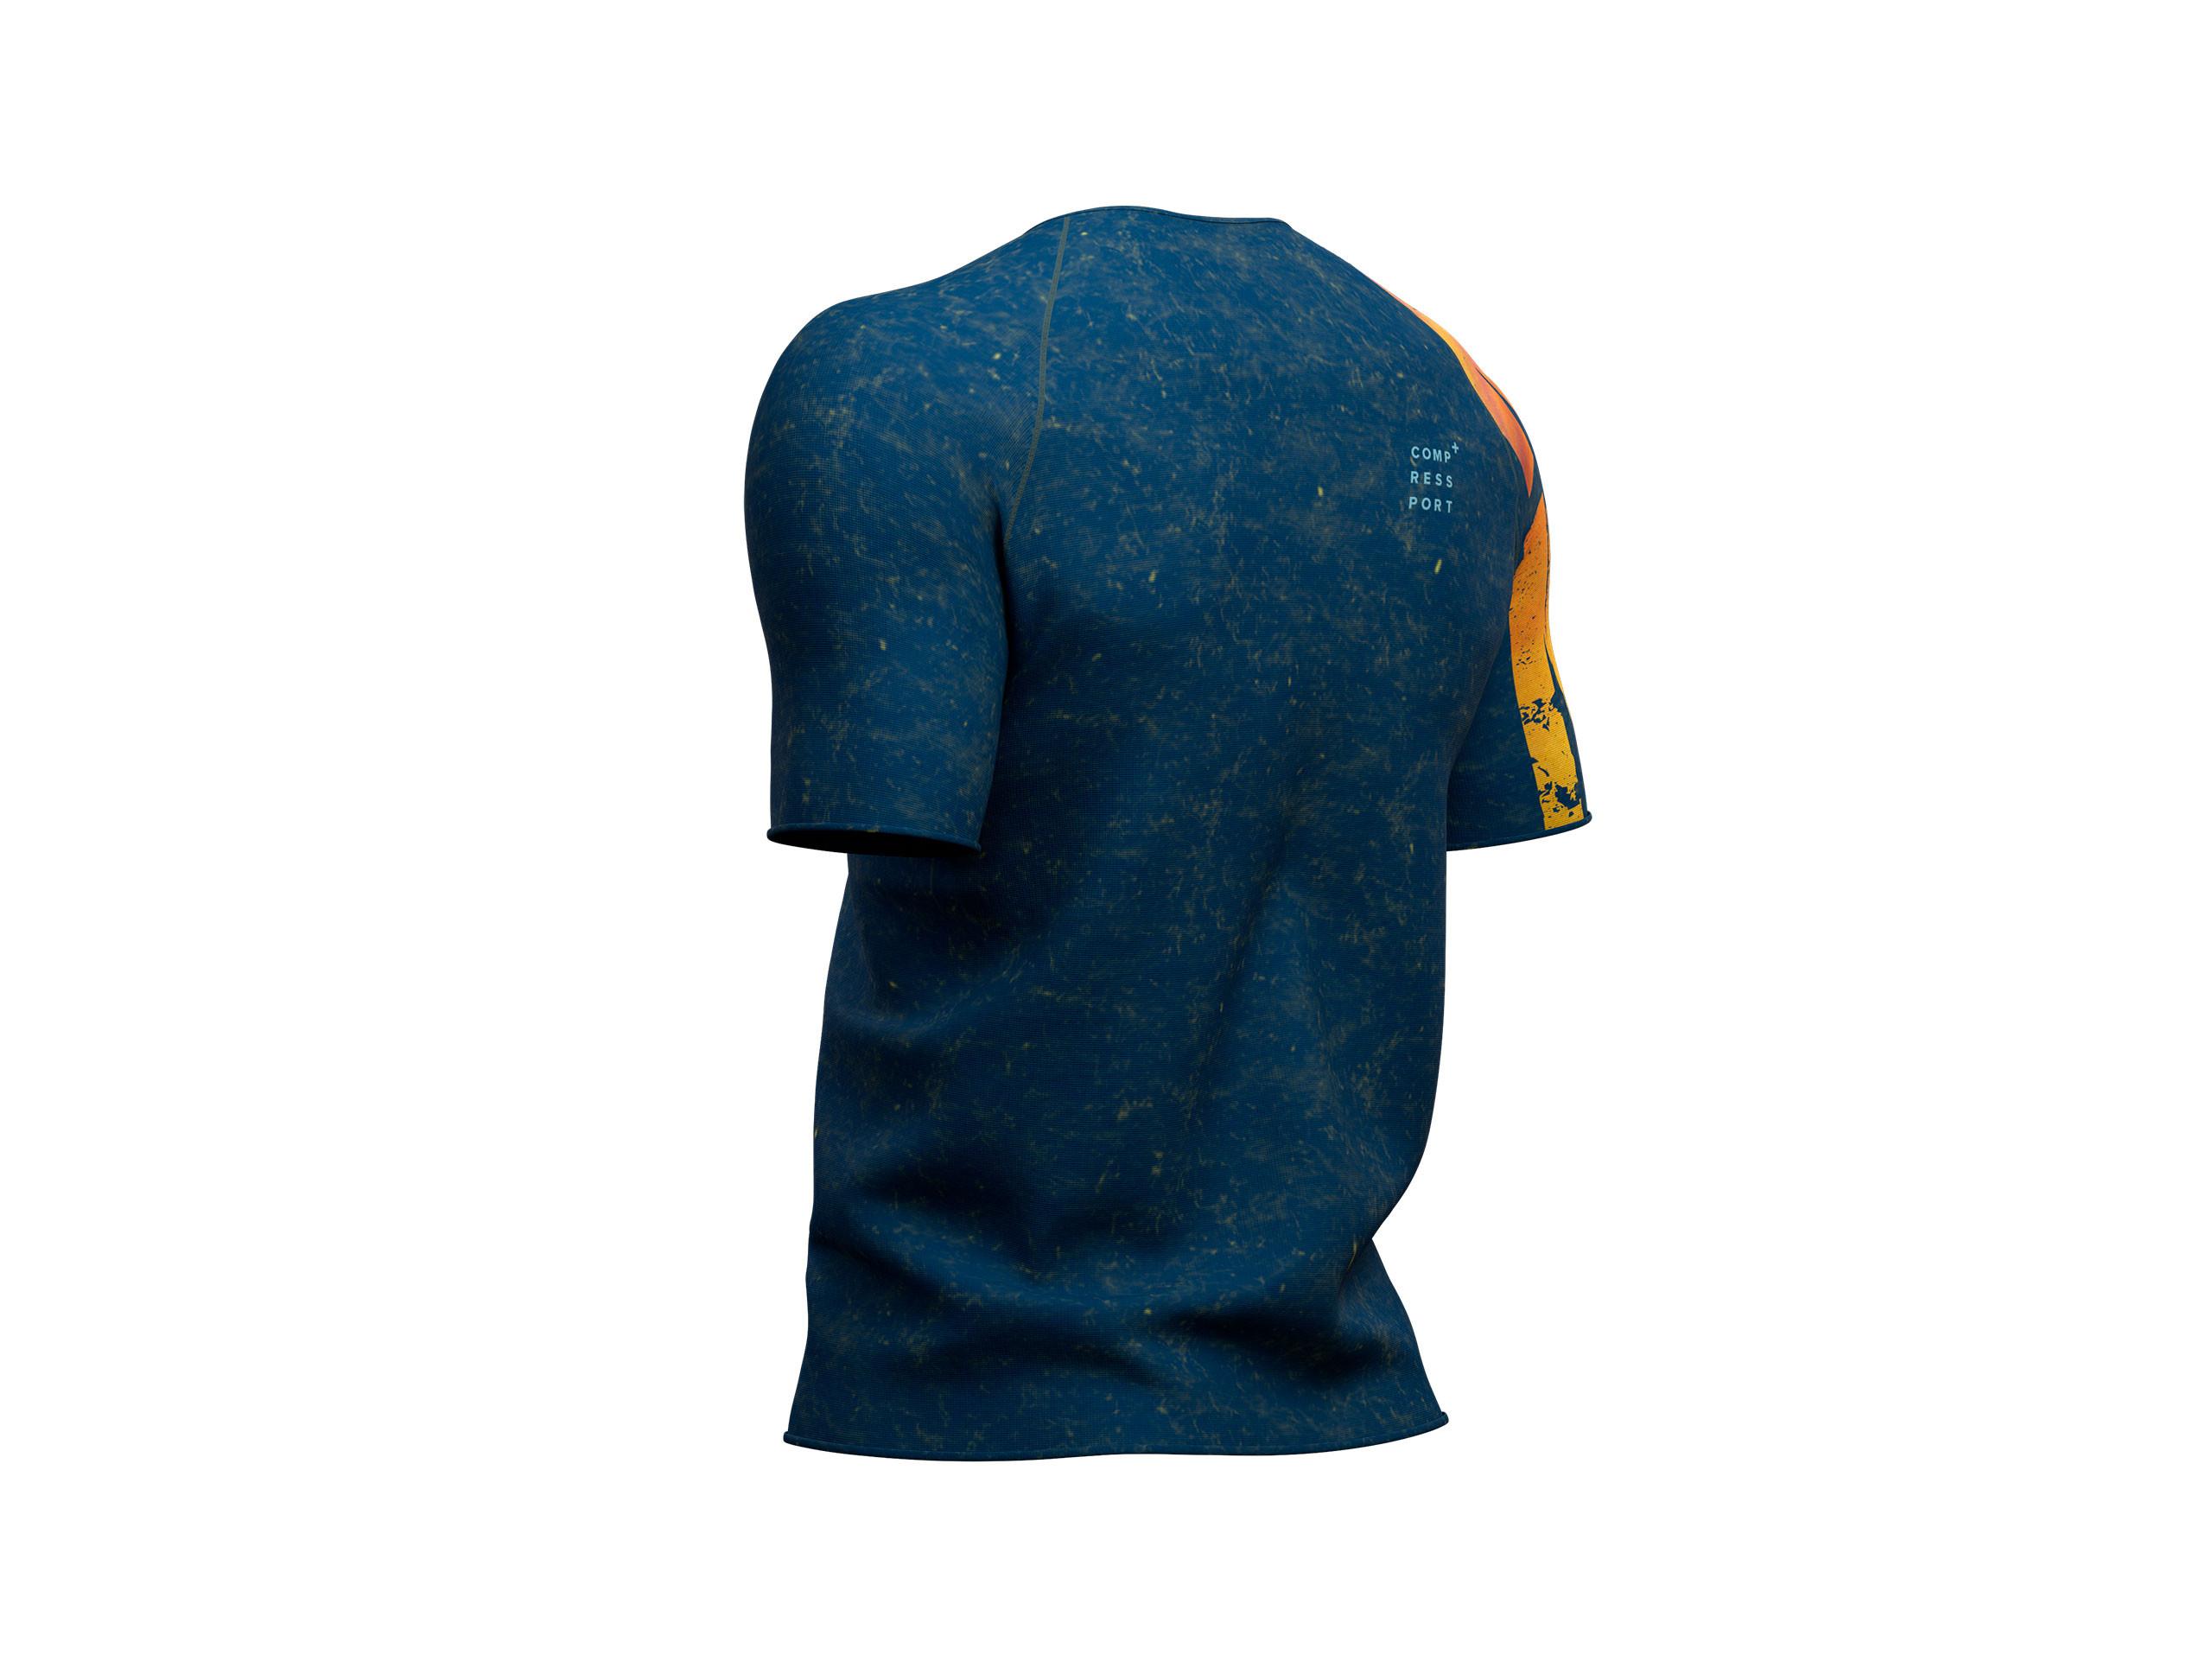 Kurzärmeliges Trainingsshirt - Kona 2019